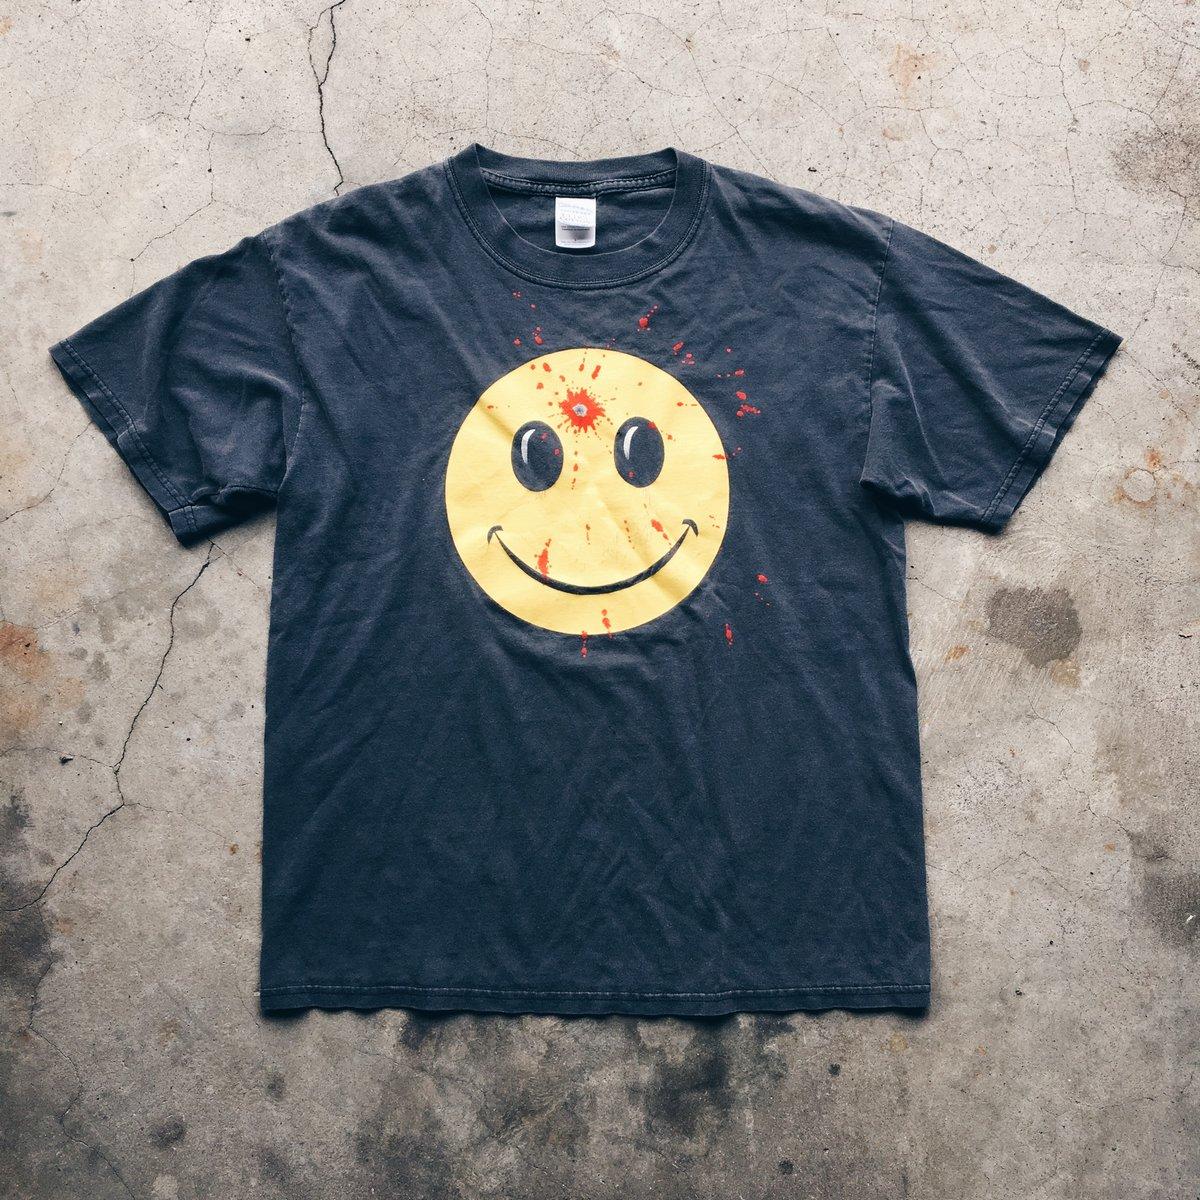 Image of Original Late 90's Smiley Tee.